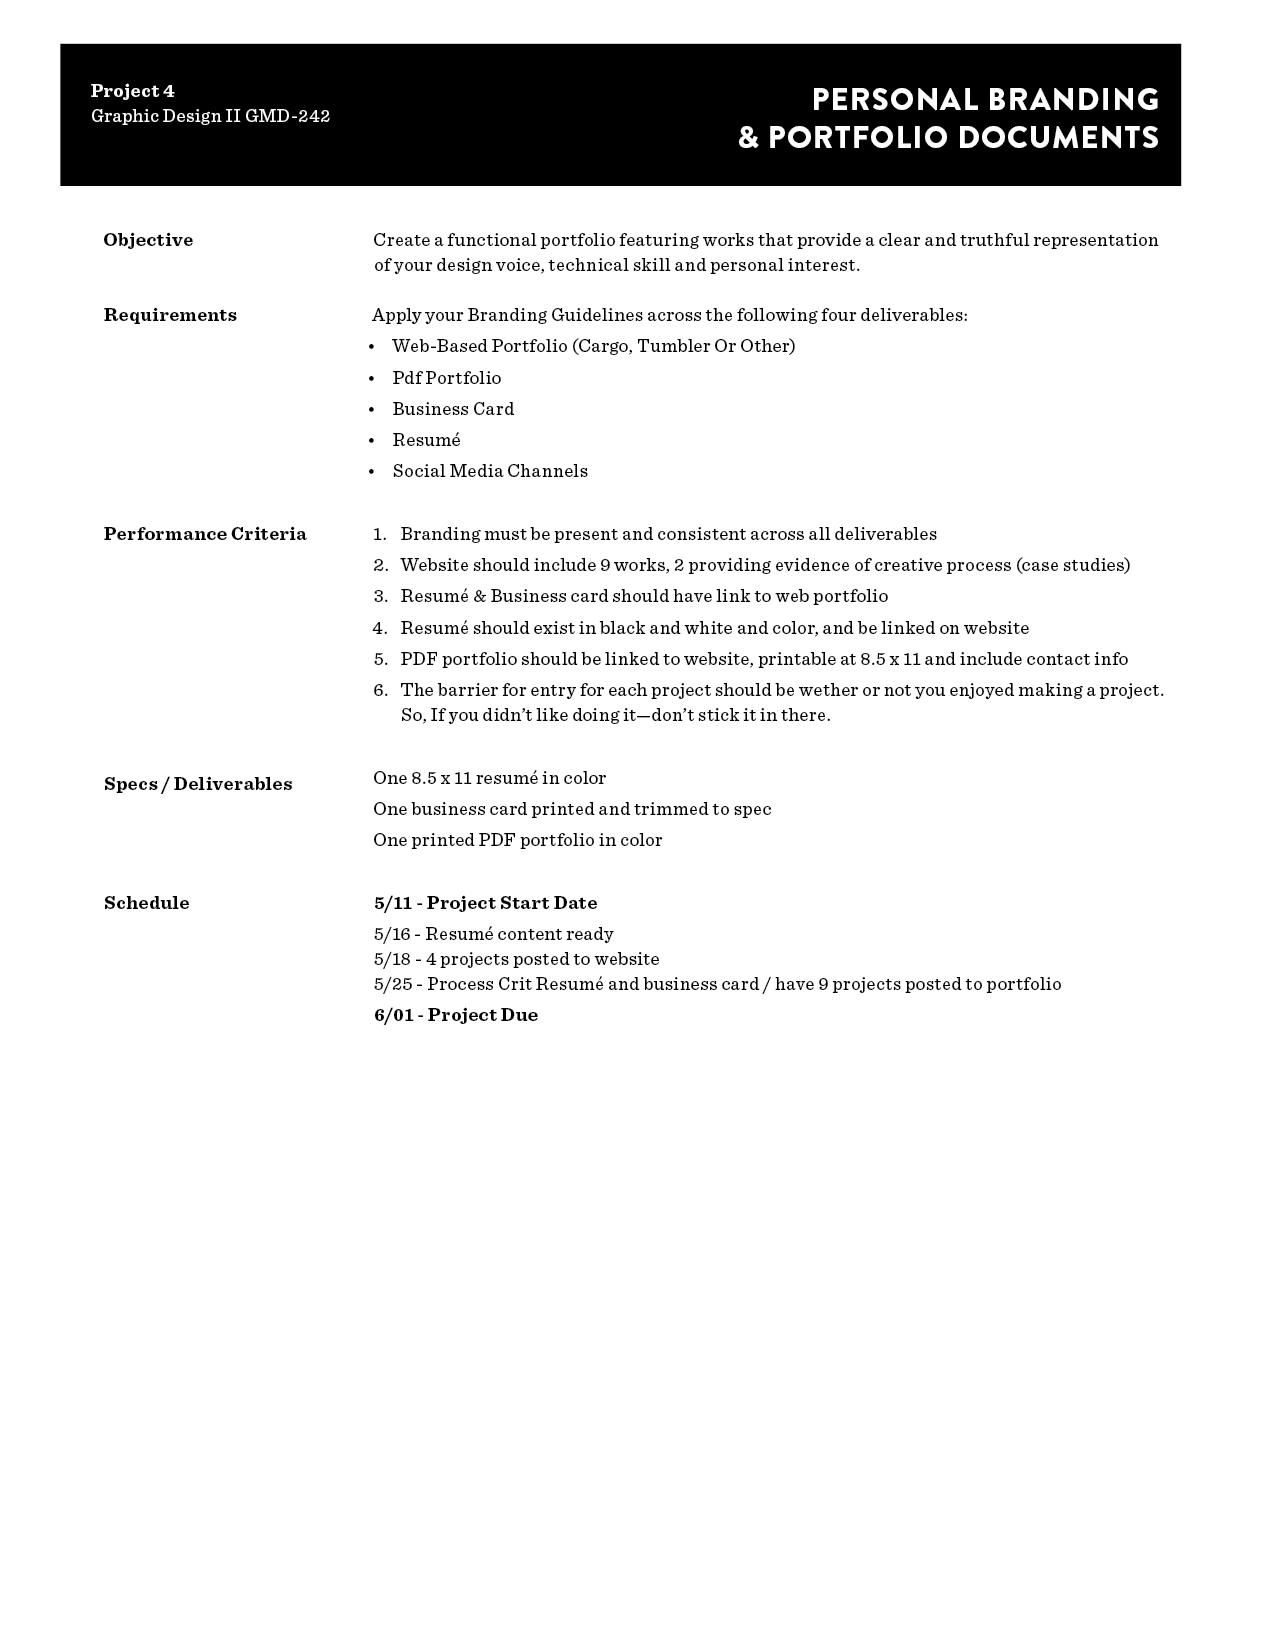 Project 4 - PortfolioBranding.png